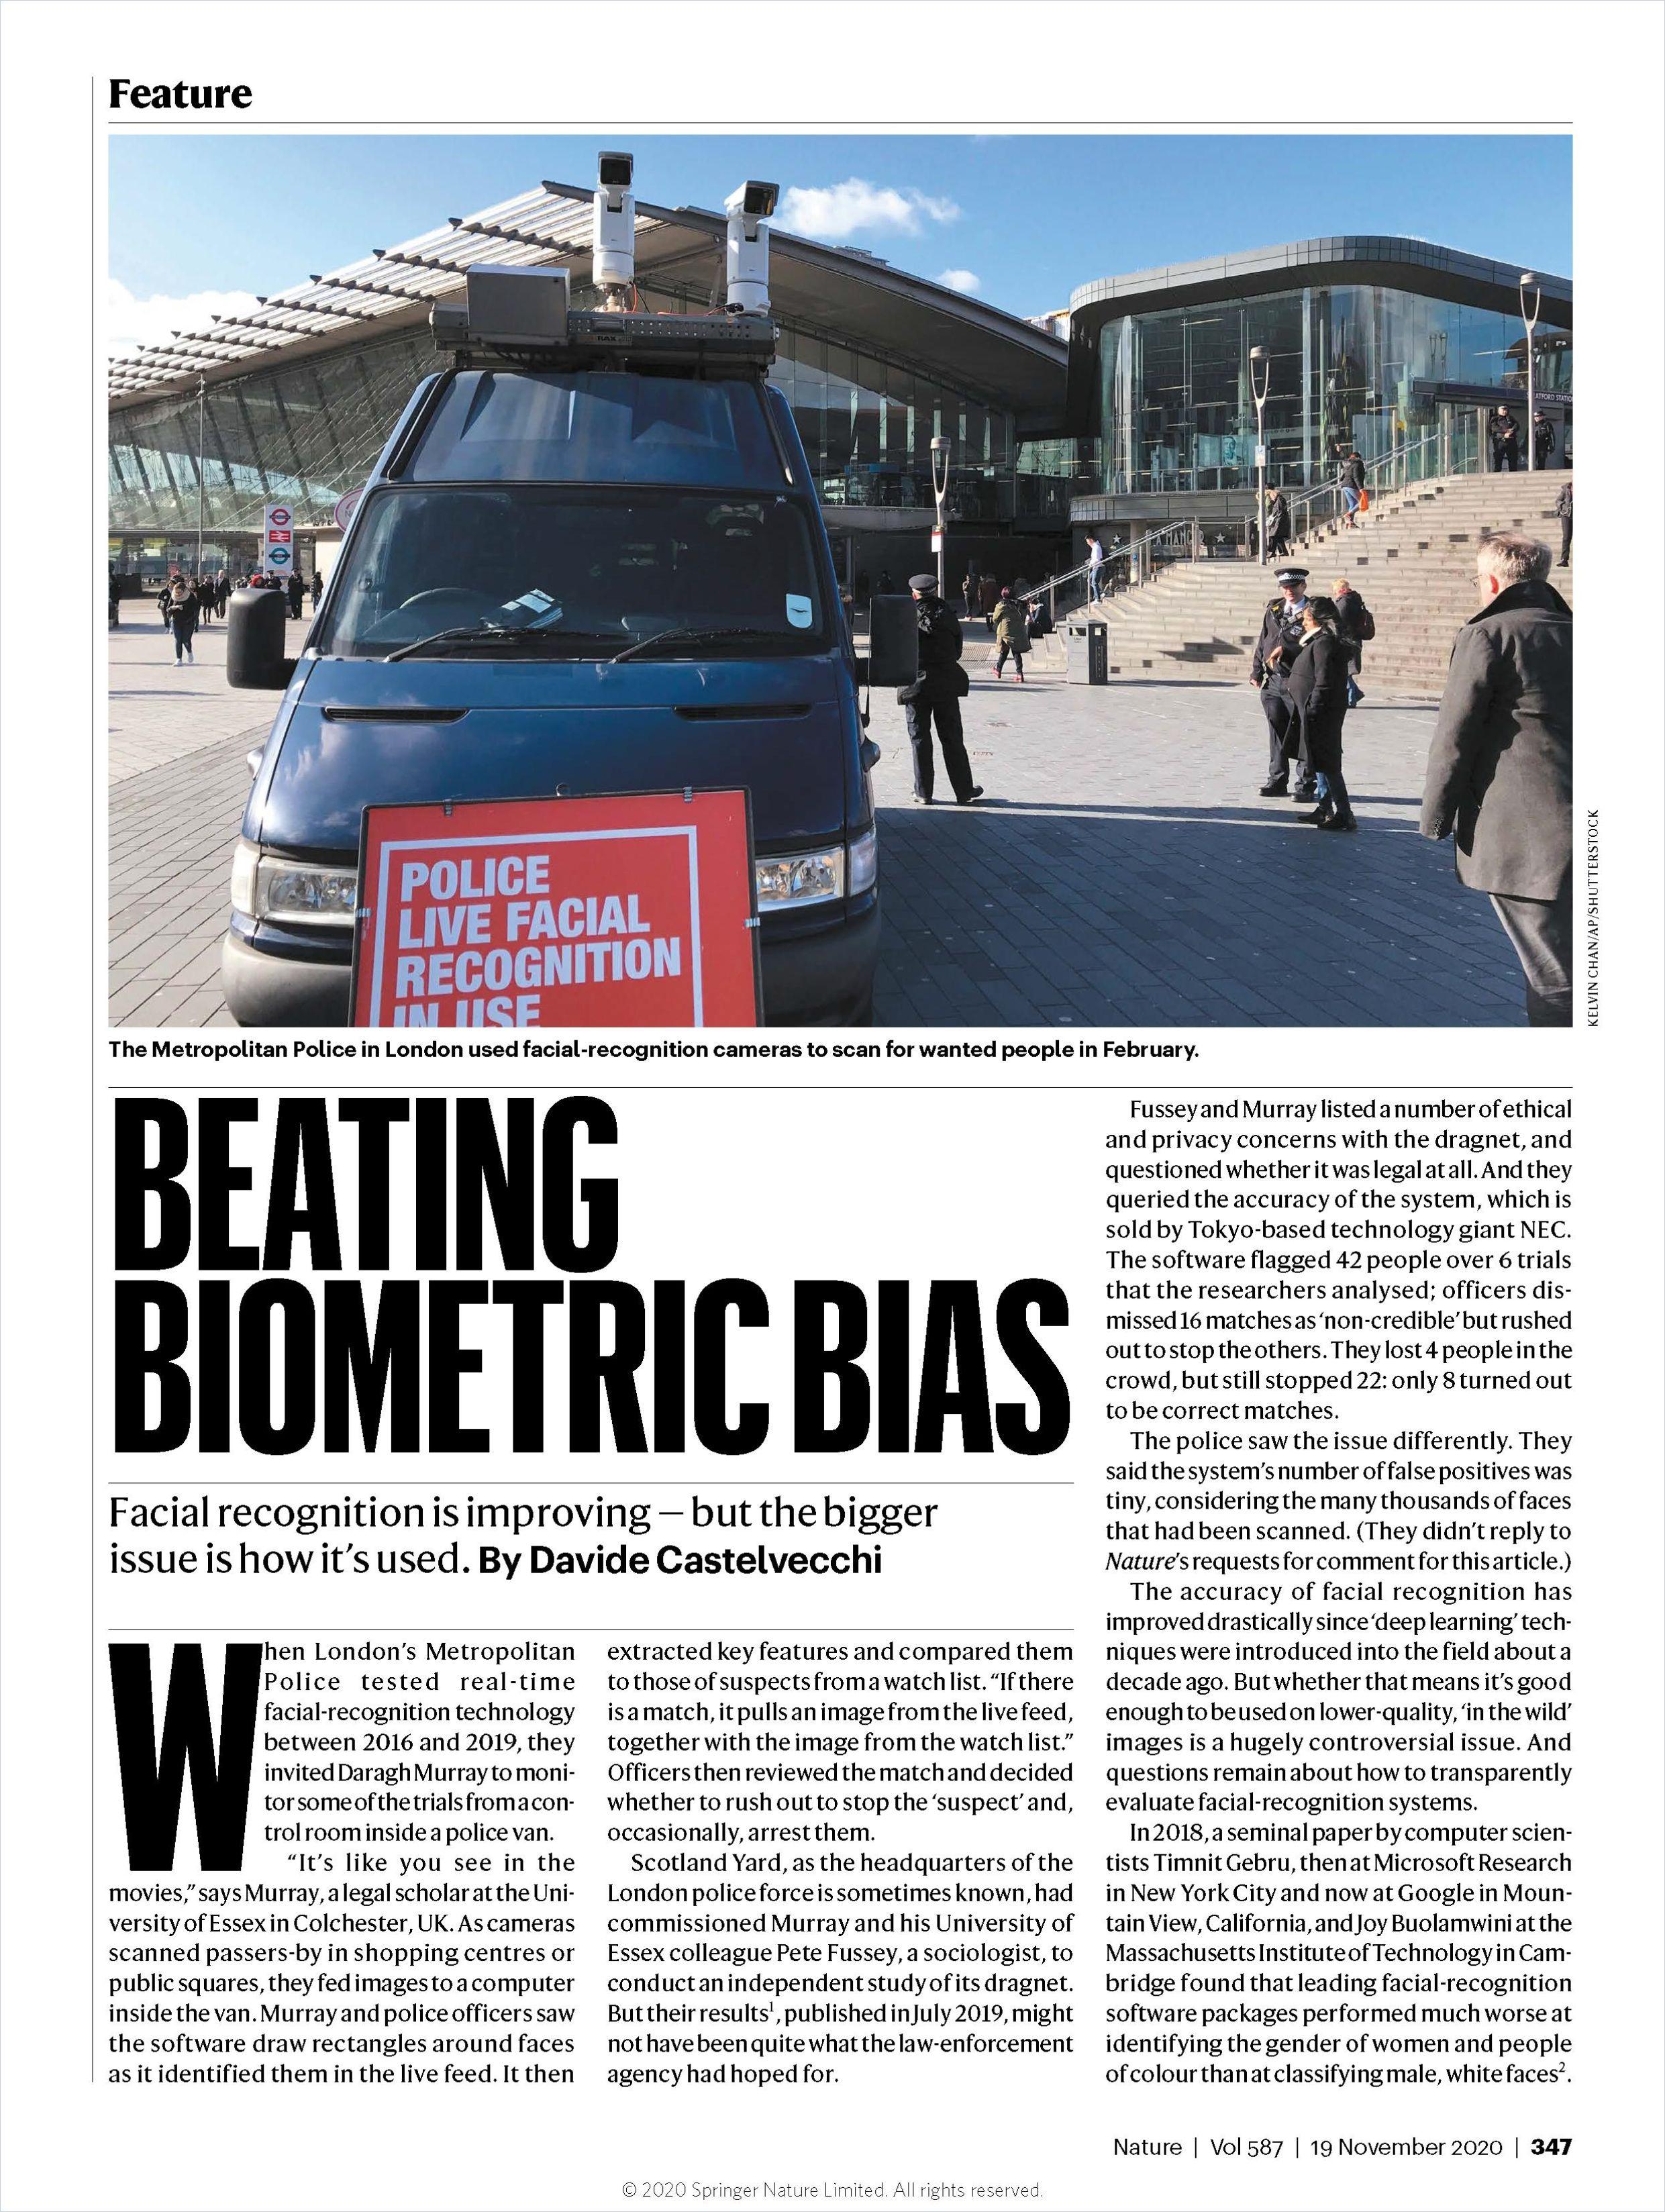 Image of: Beating Biometric Bias